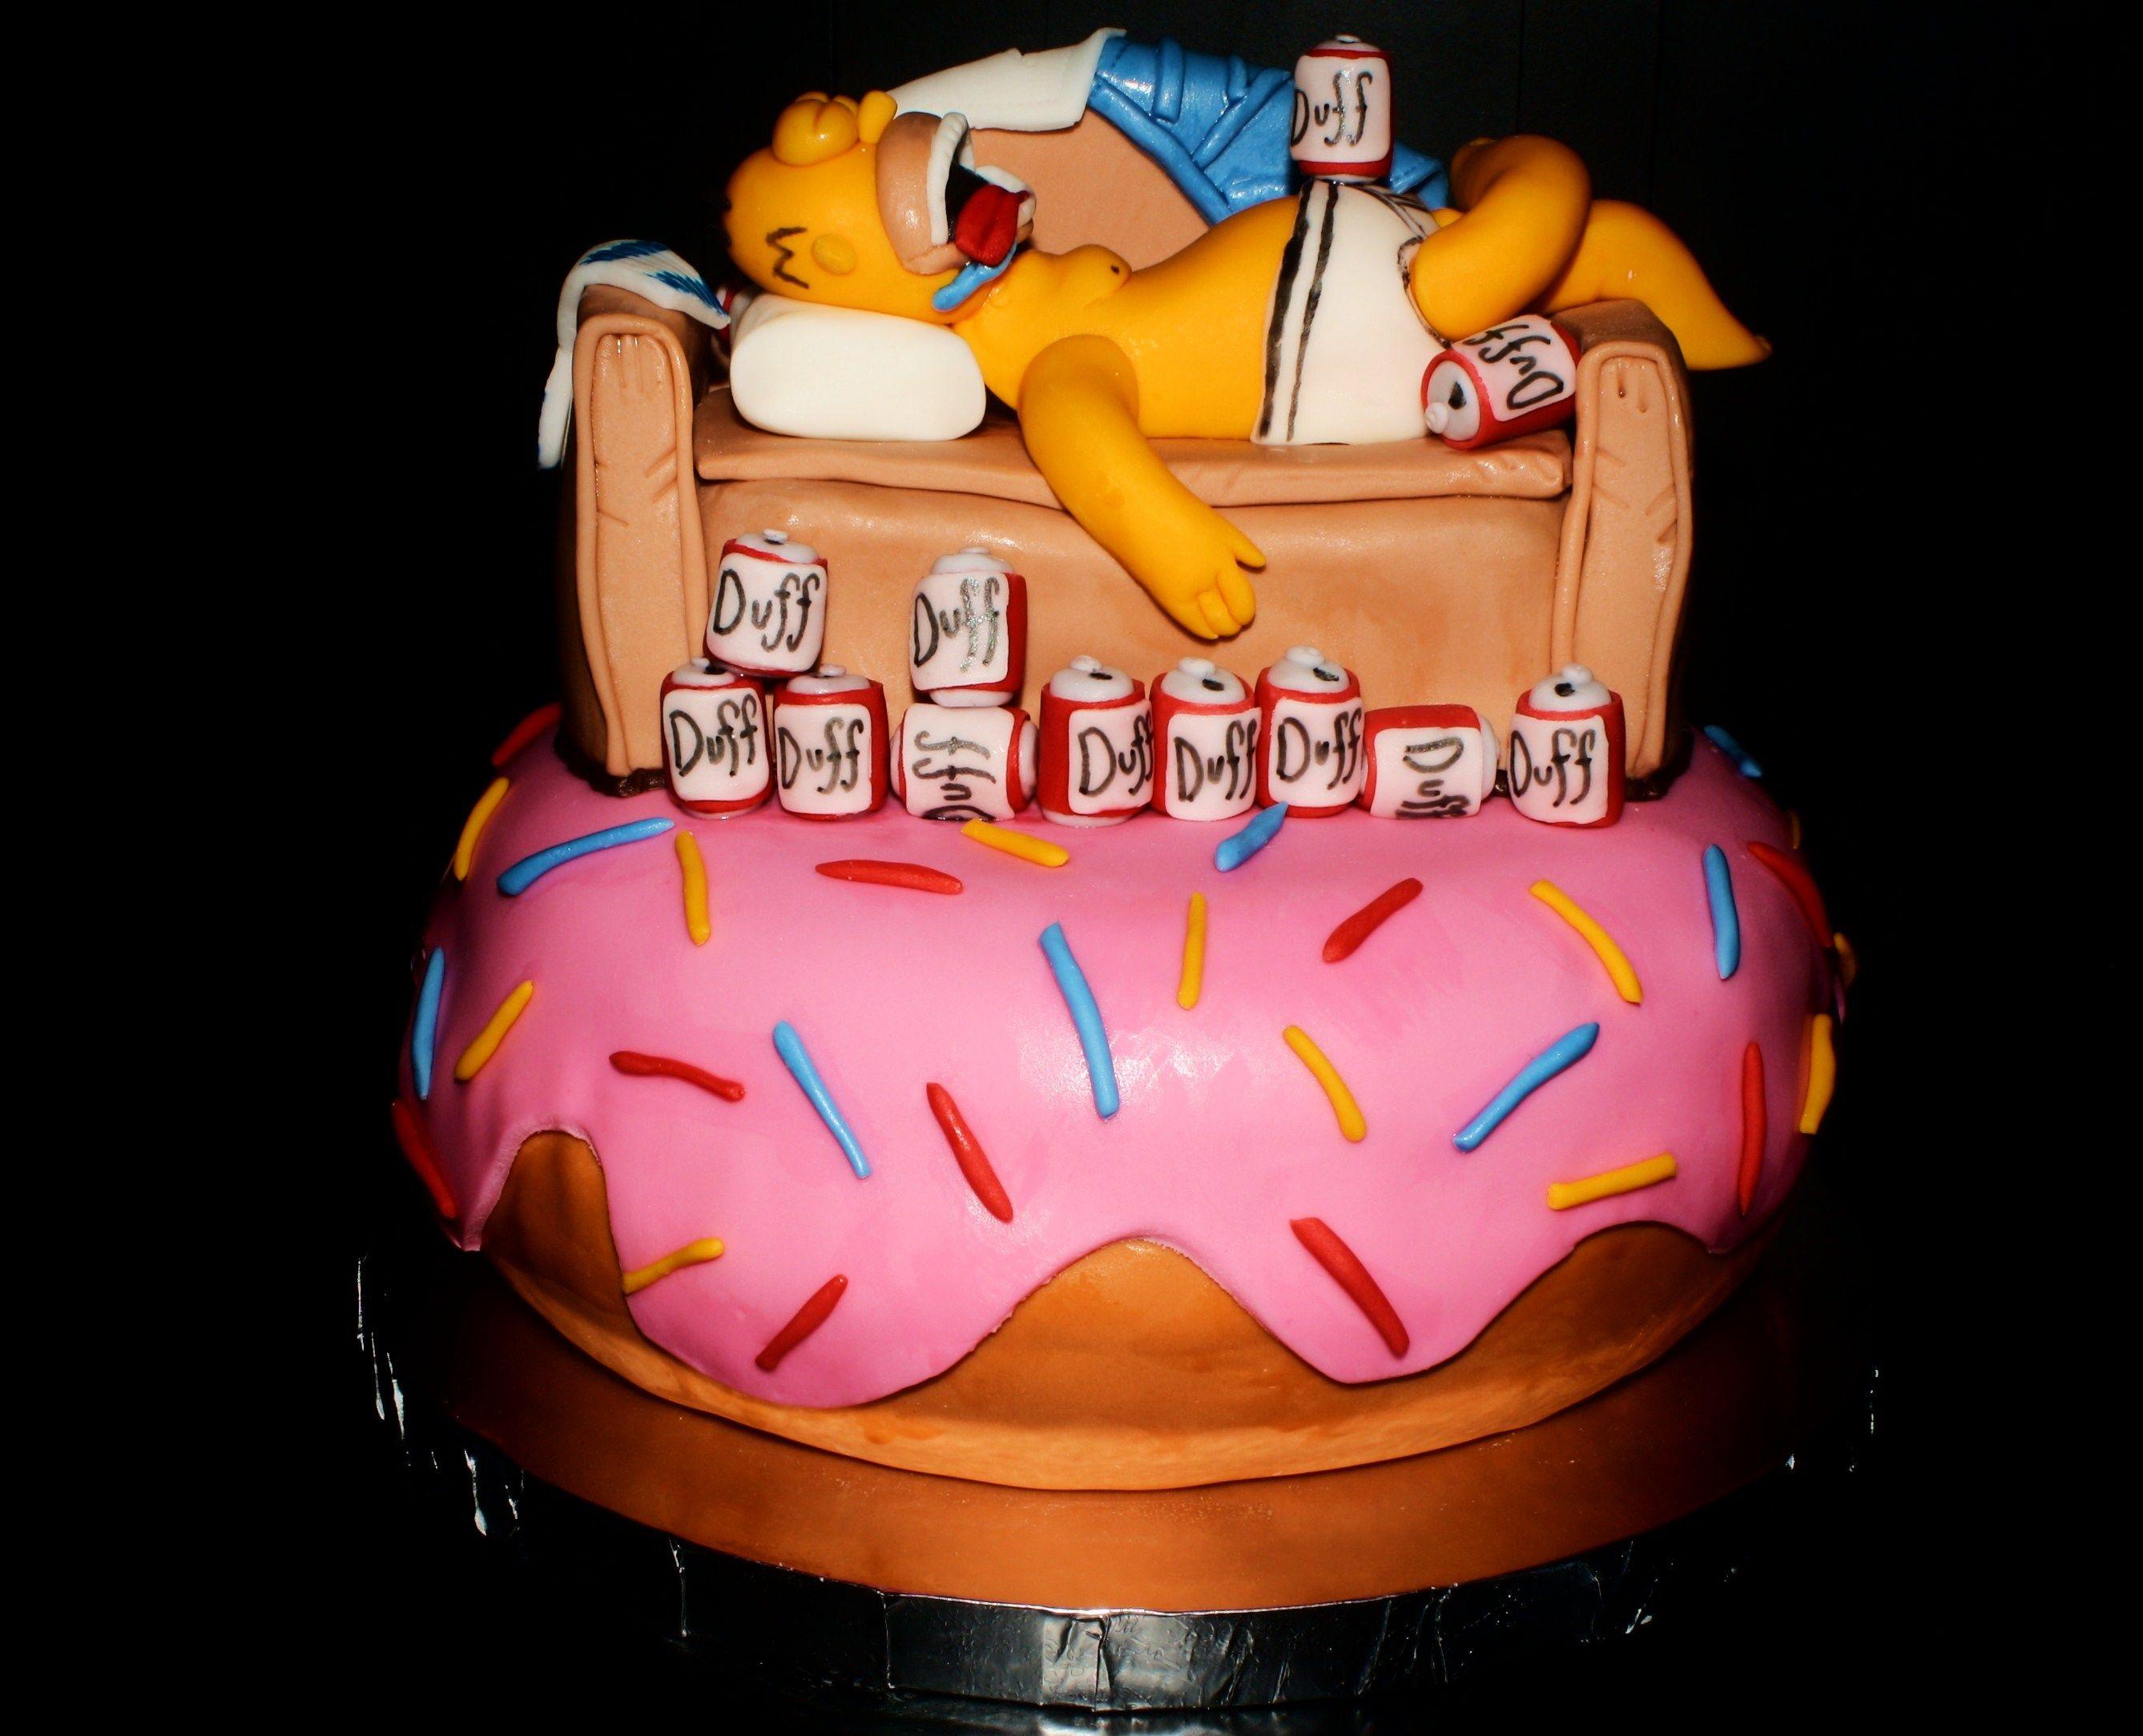 Pleasant Homer Simpson Birthday Cake Simpsons Cake Homer Simpson Cake Funny Birthday Cards Online Sheoxdamsfinfo